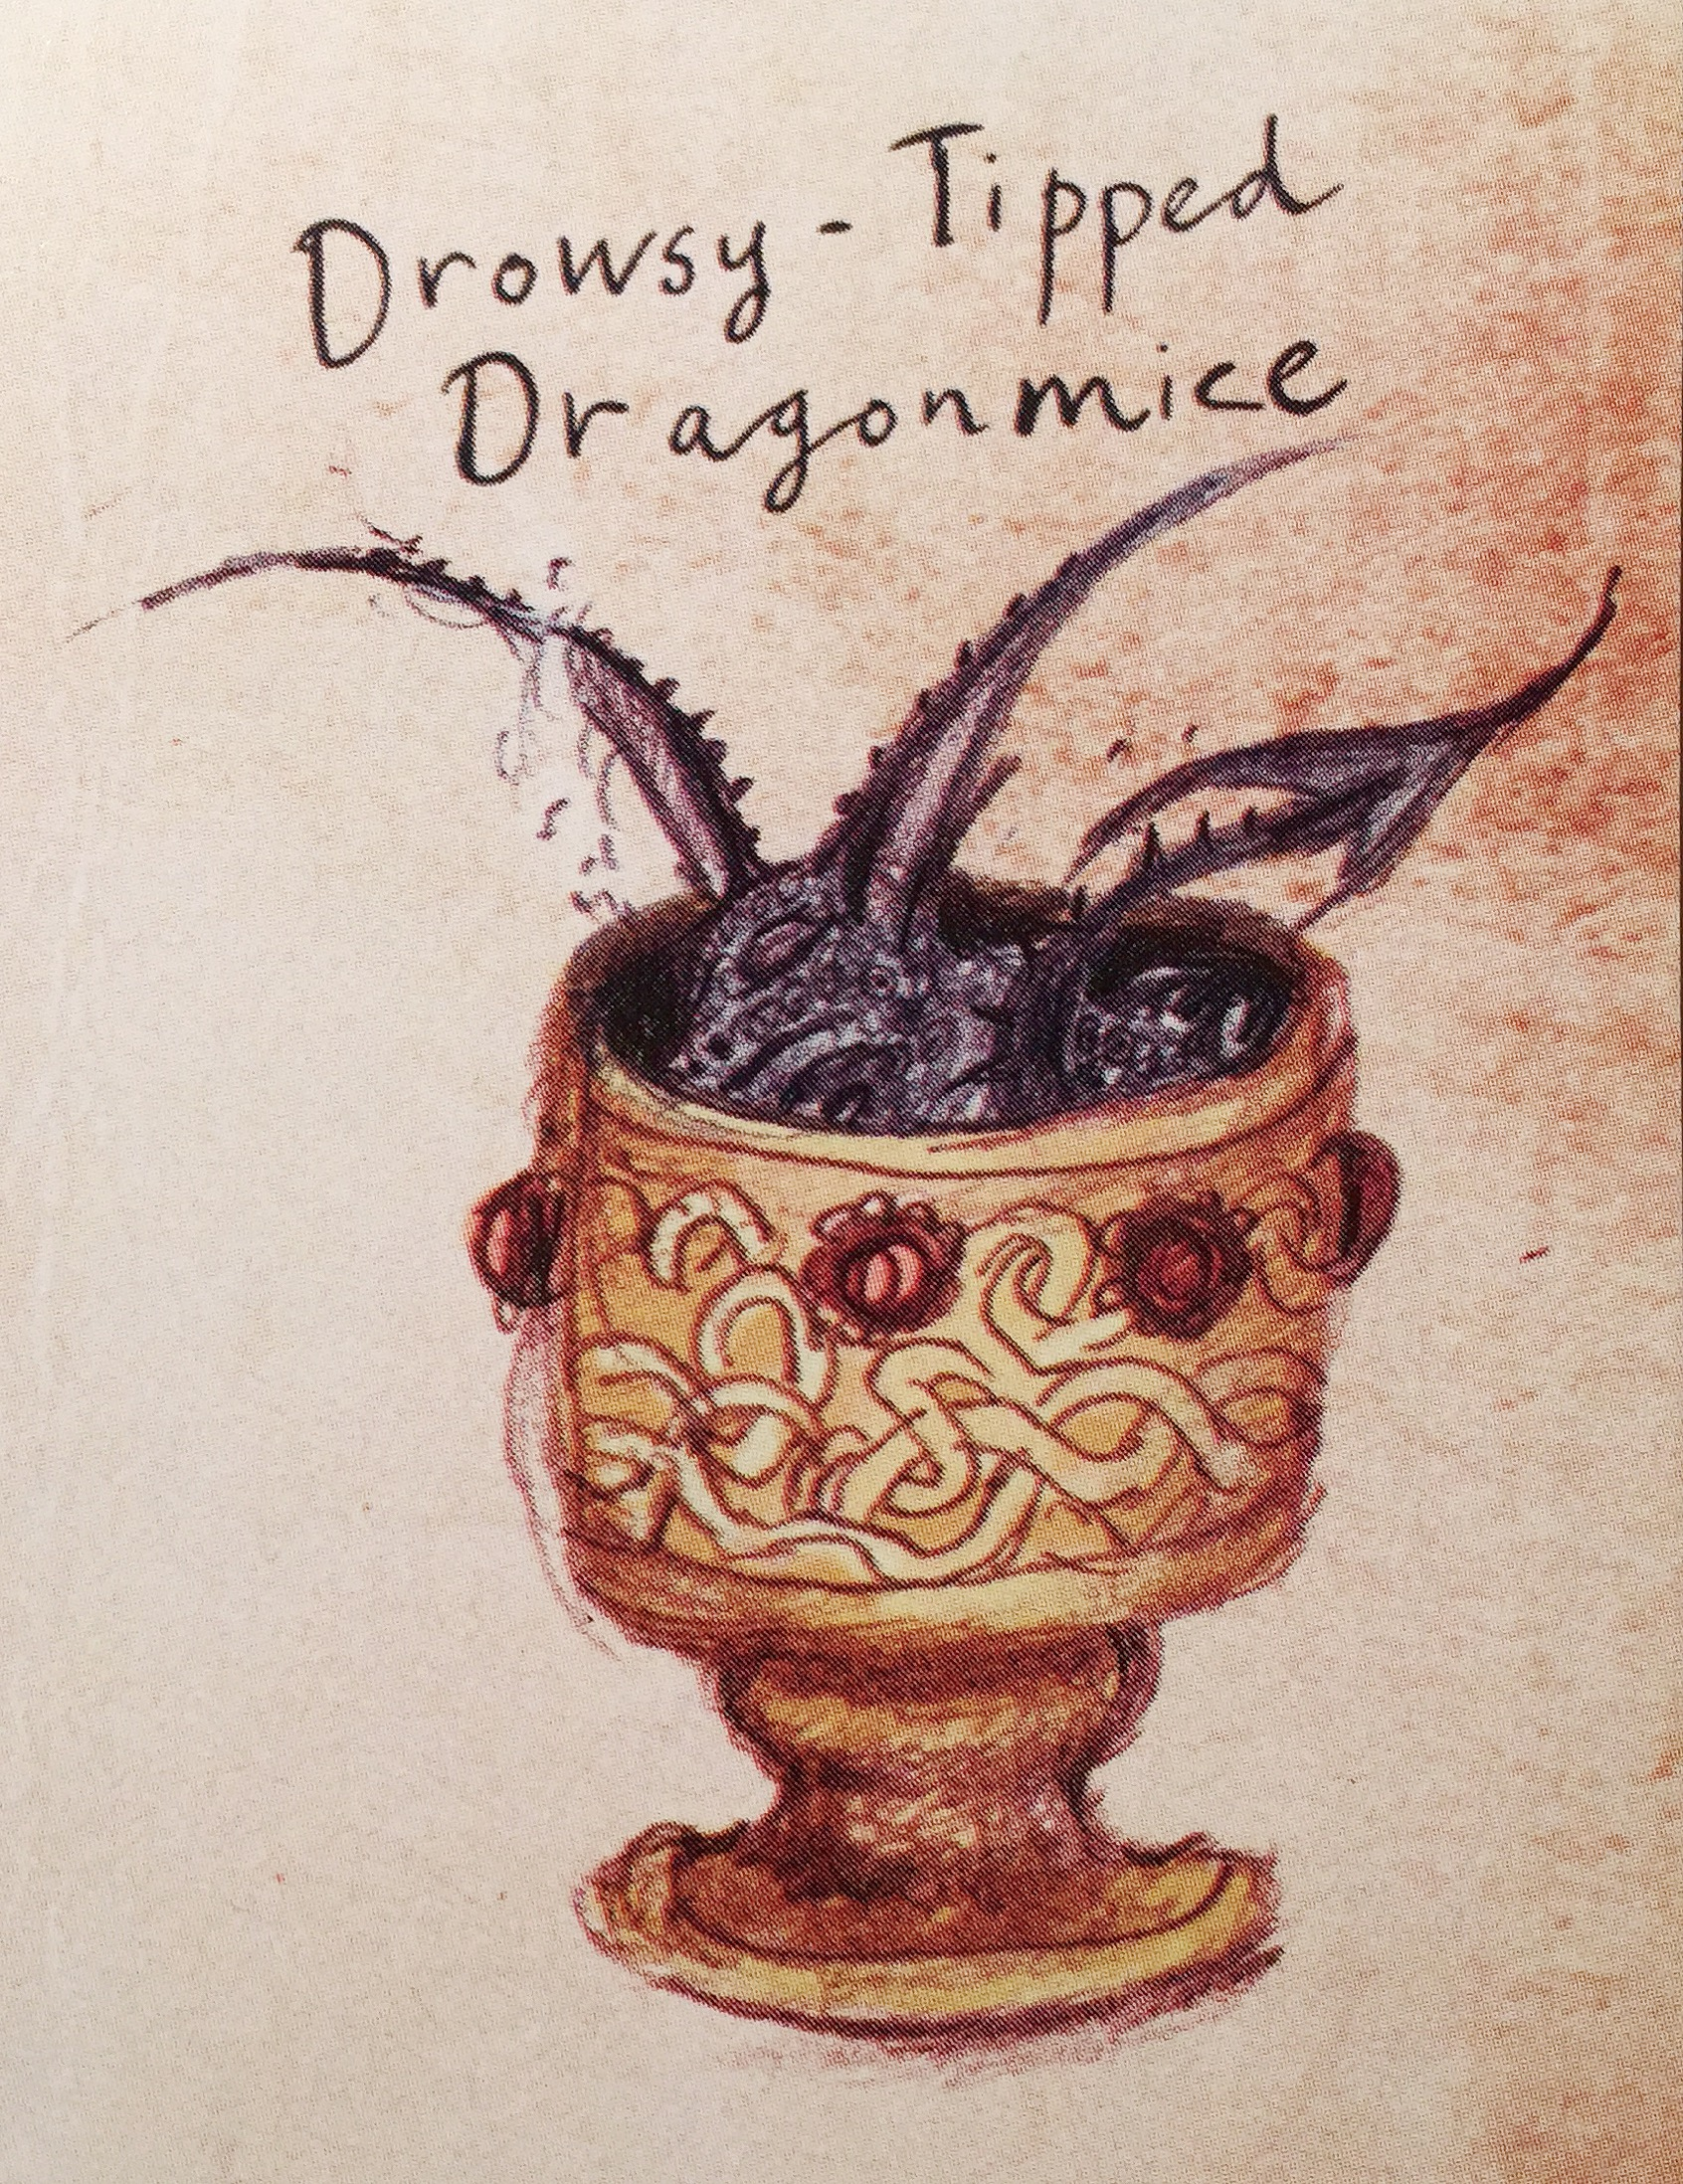 DrowsyTippedDragonmouse1